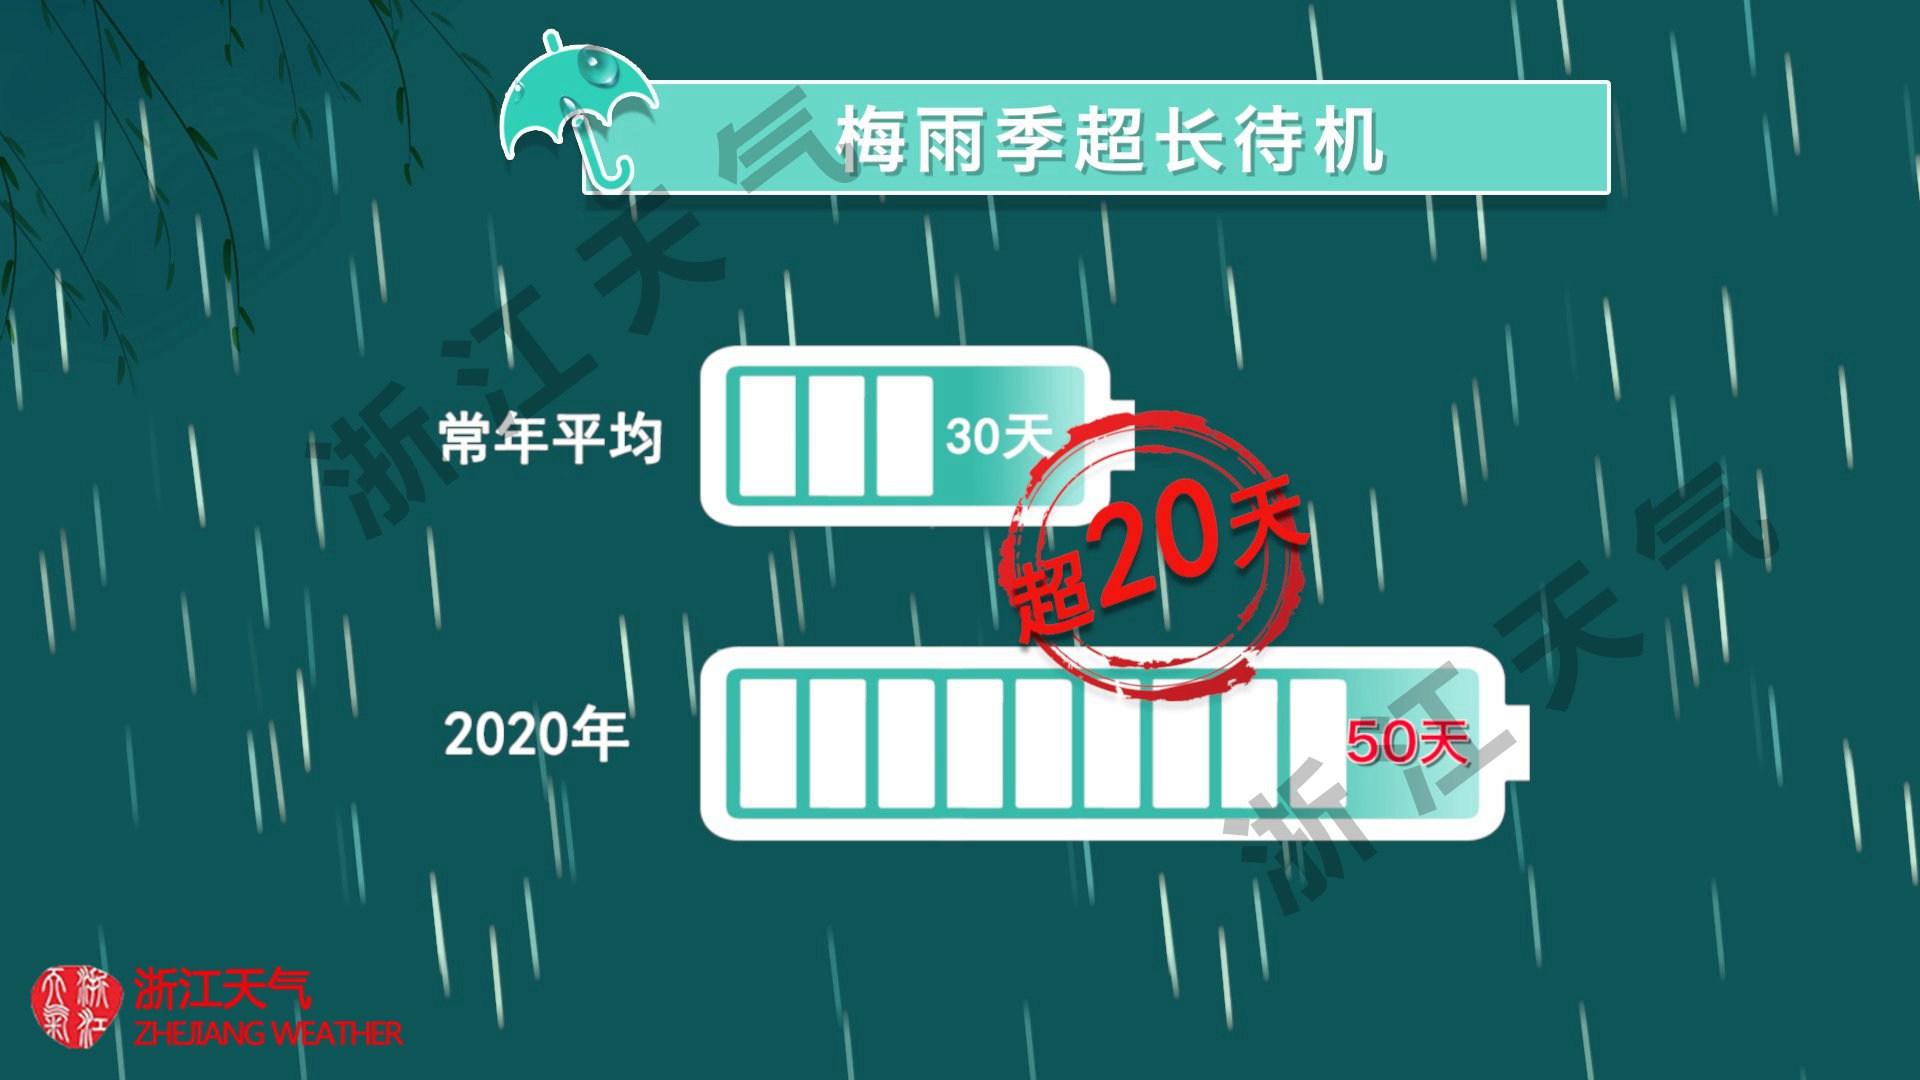 http://i.weather.com.cn/images/zhejiang1/rdzt/2020/07/19/1595150605577080196.jpg